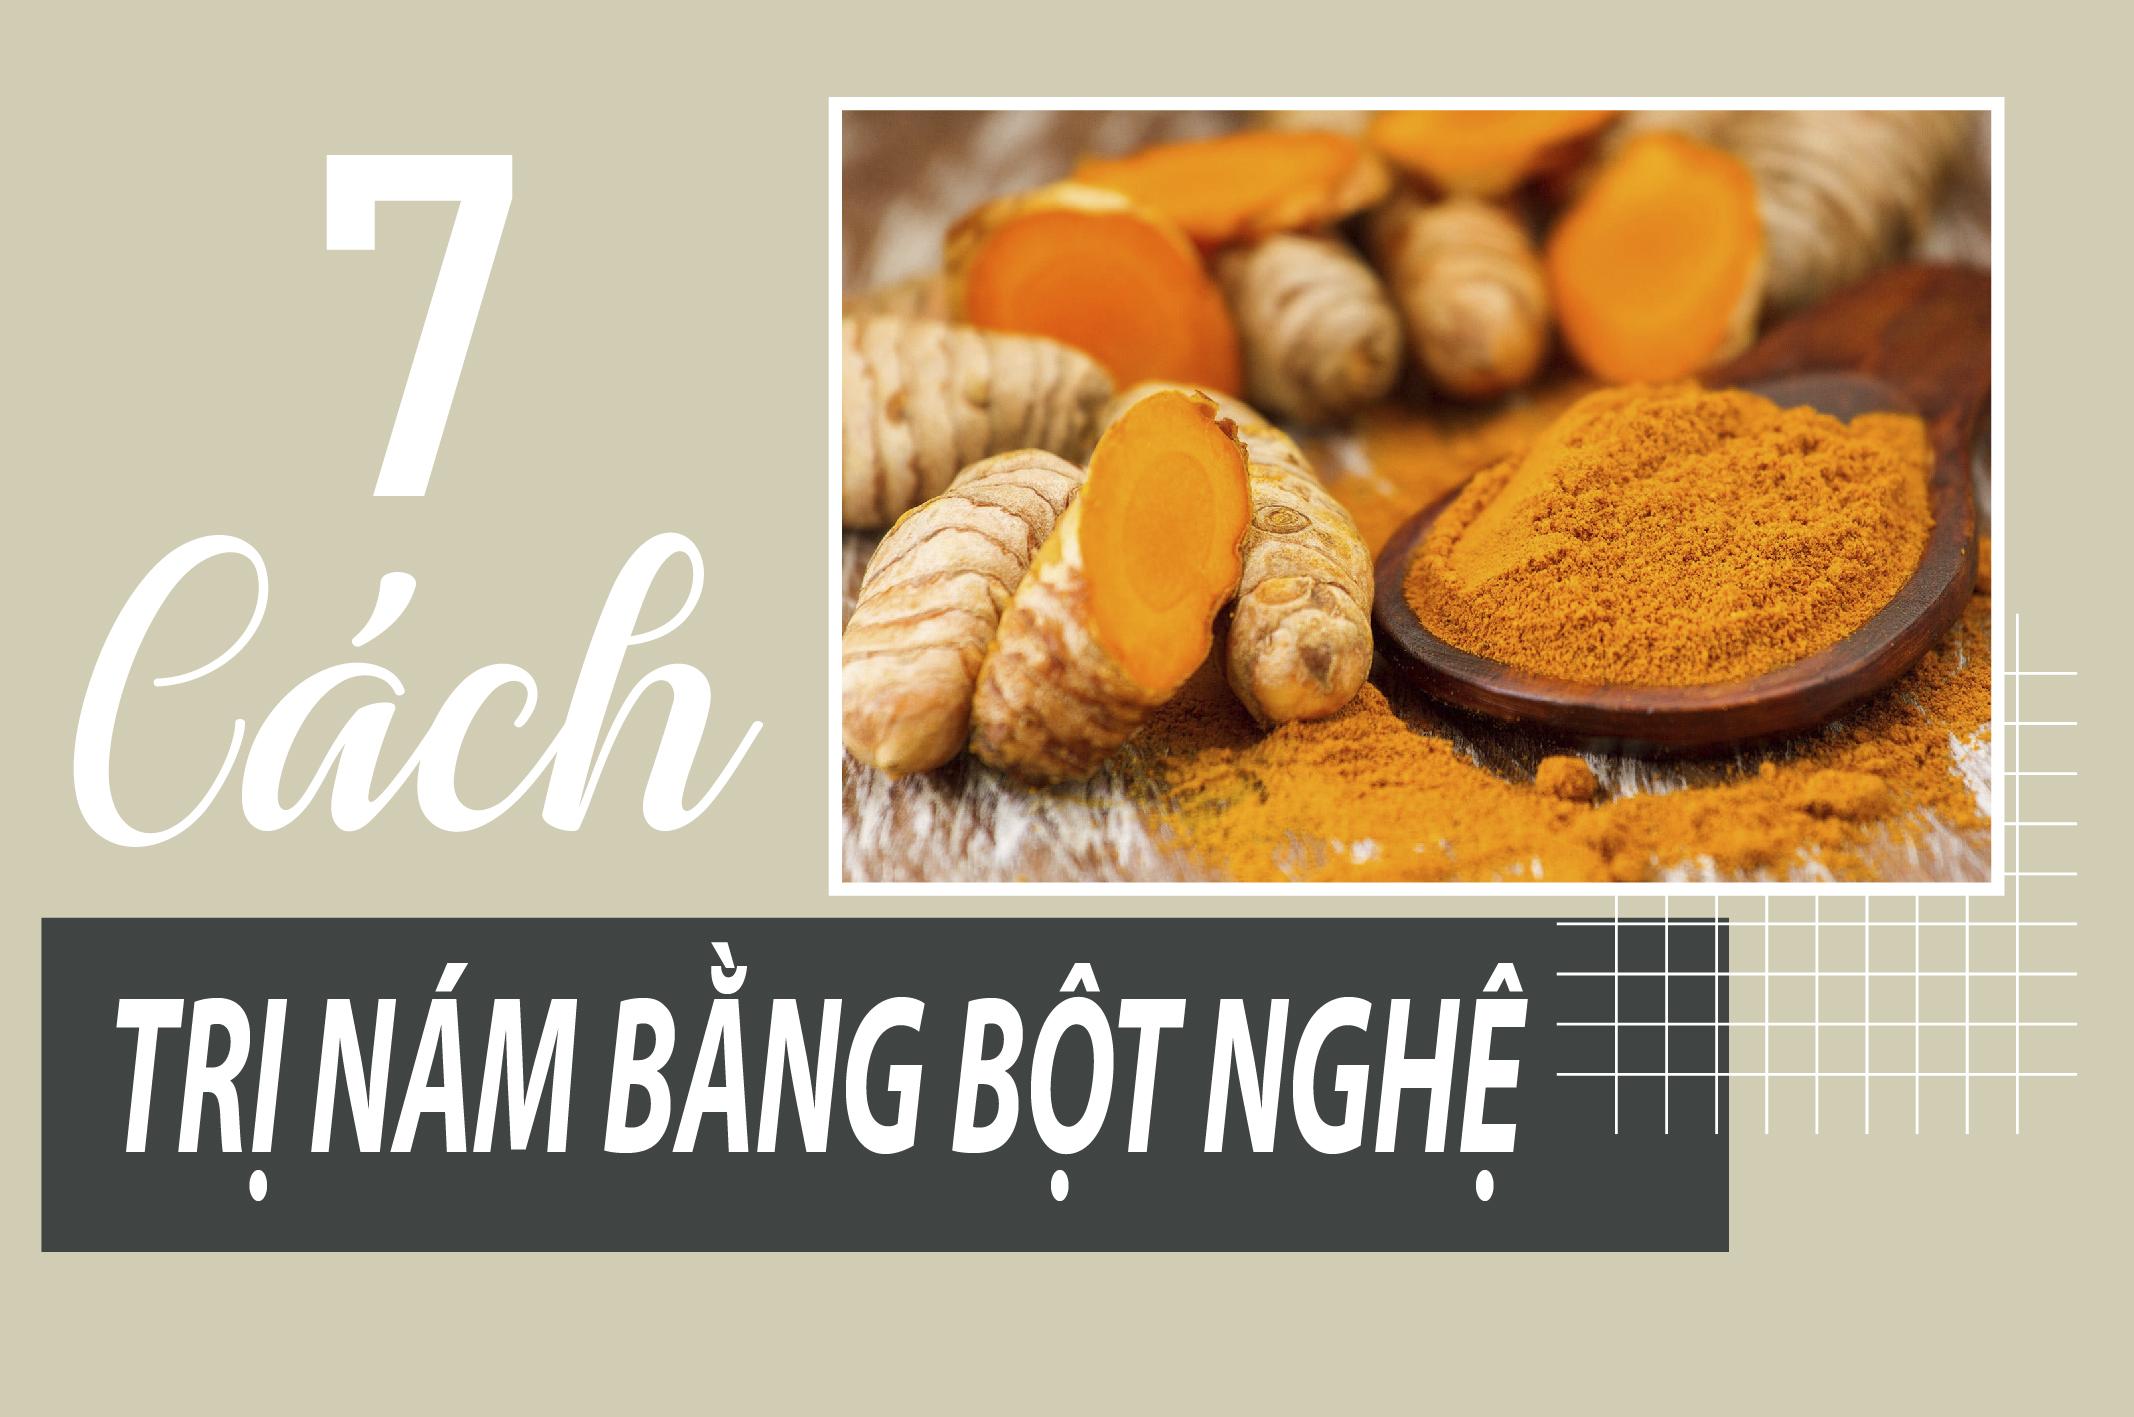 7-cach-tri-nam-bang-tinh-bot-nghe